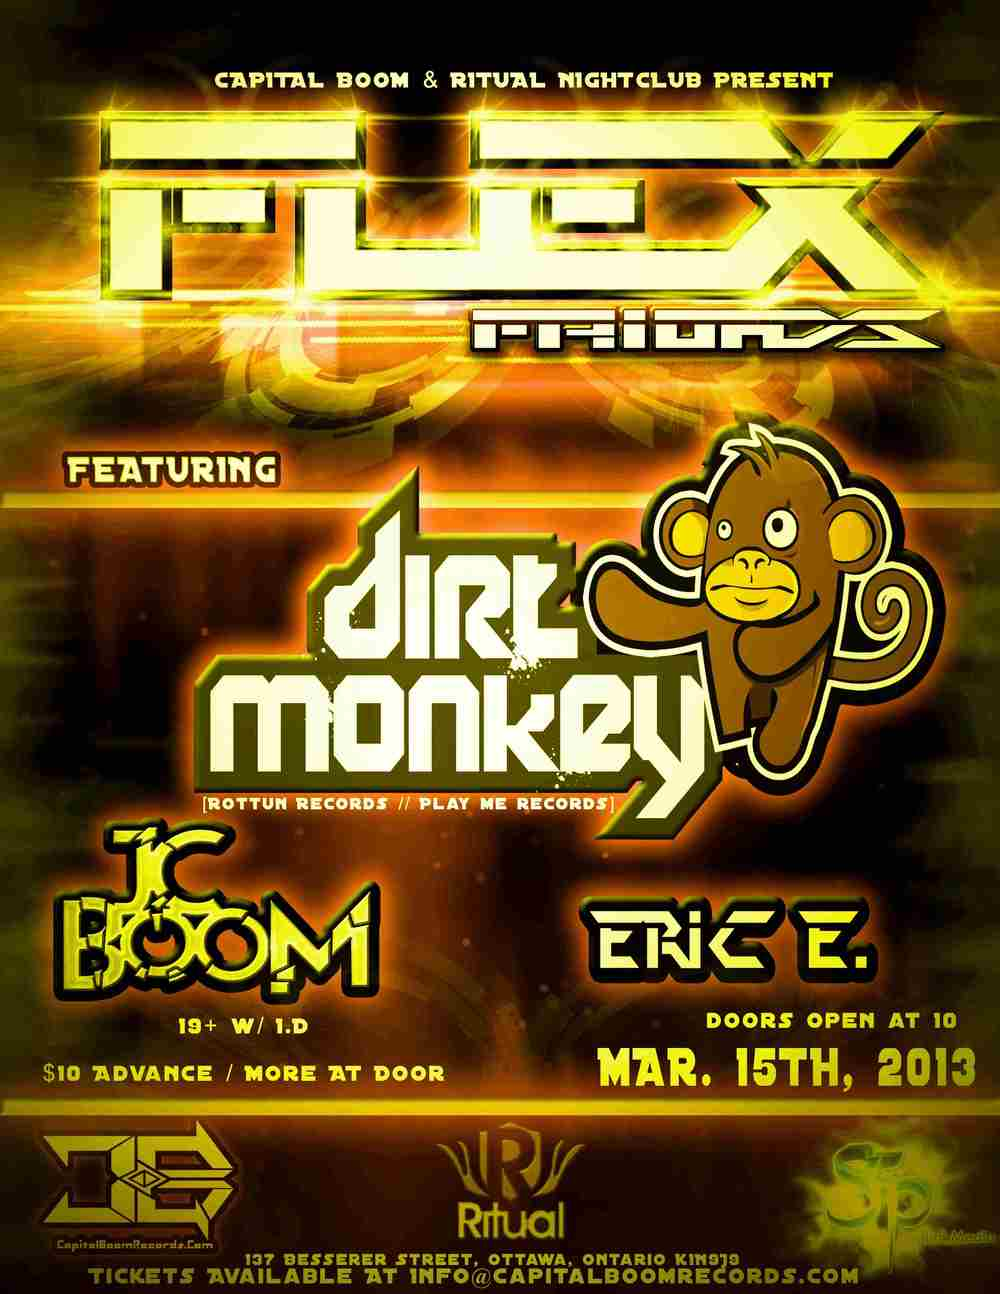 Dirty Monkey, JC Boom, Eric E Flex Friday Ritual